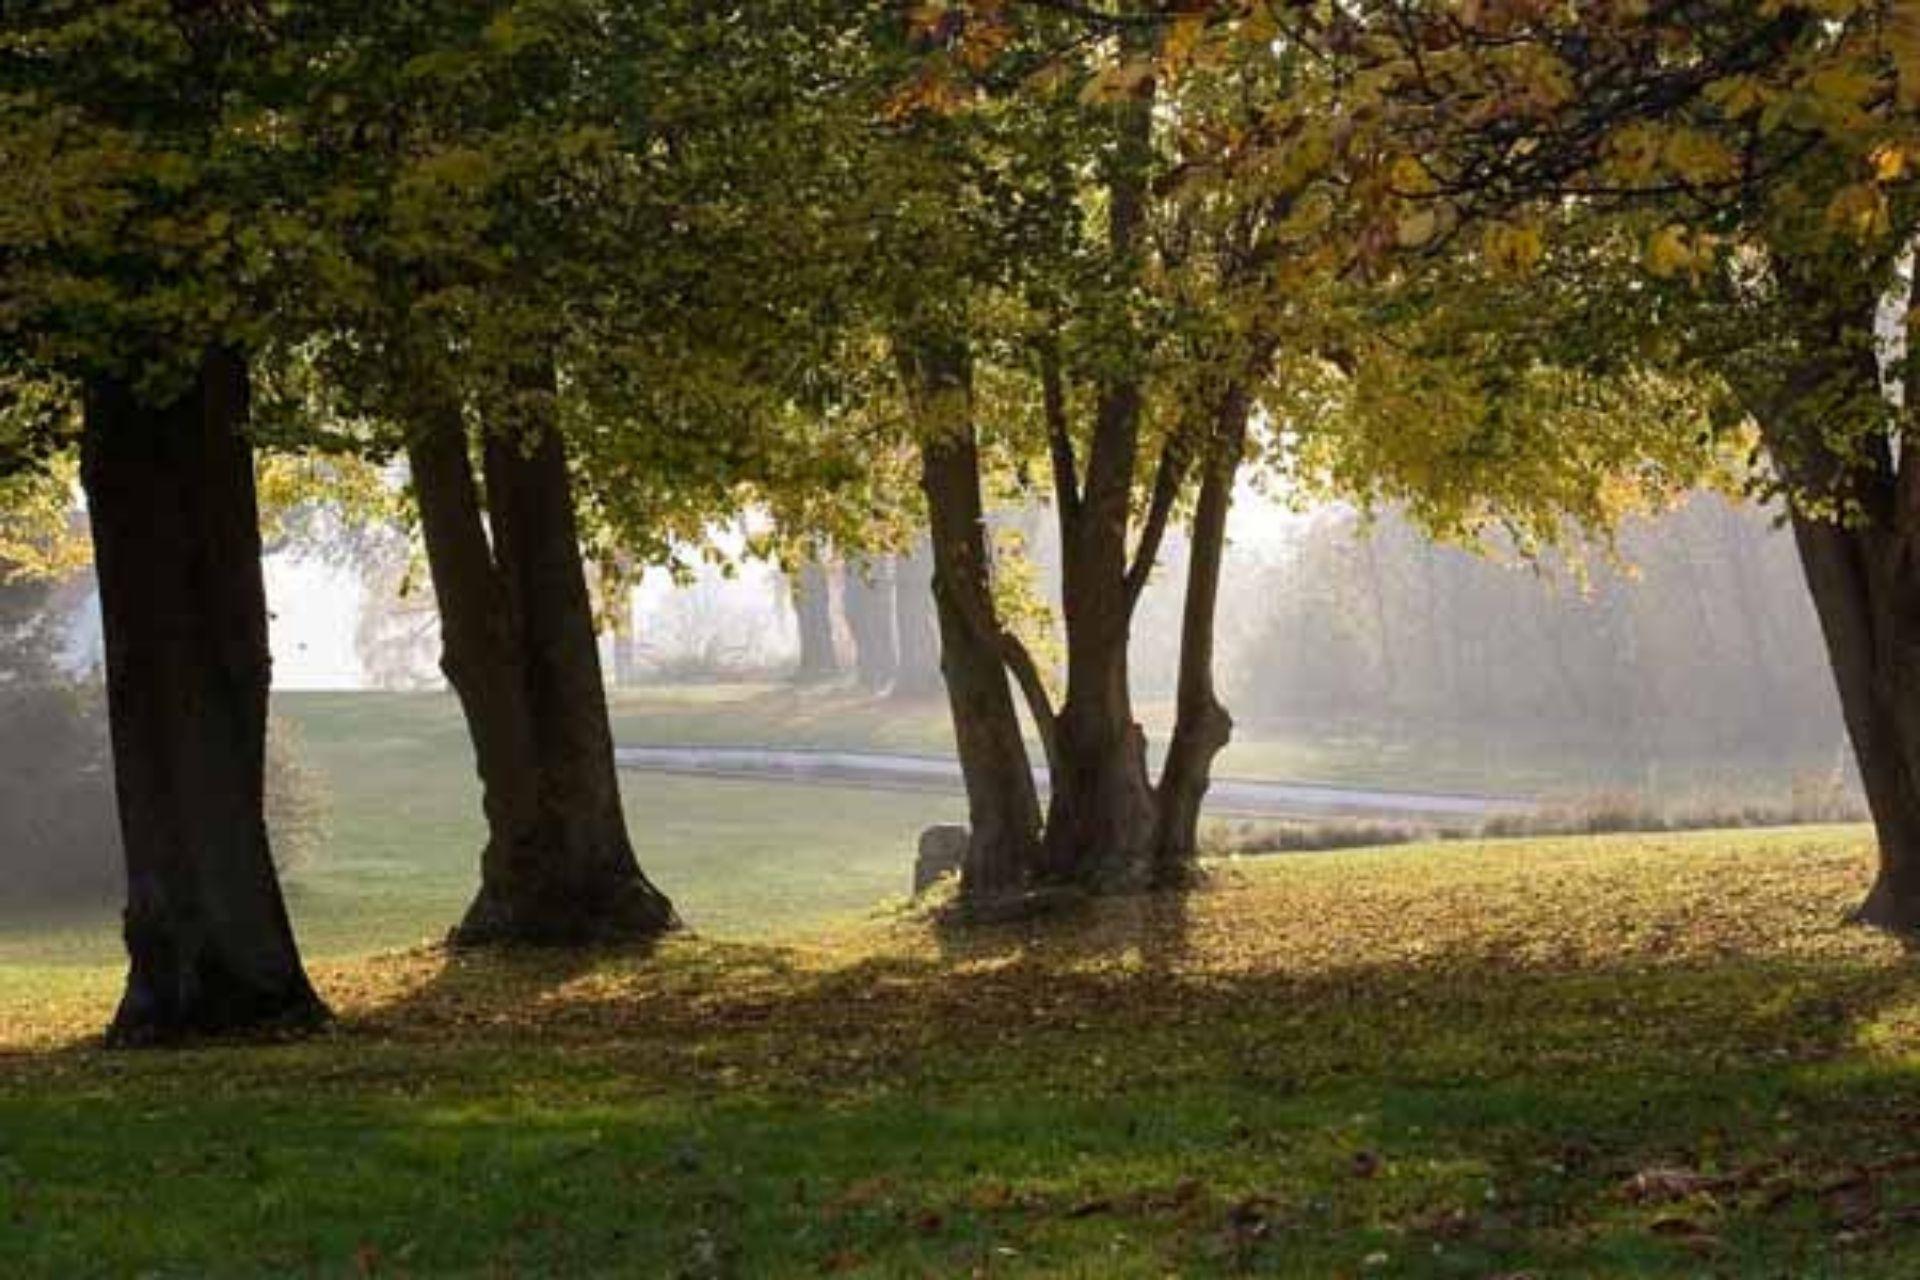 Parco di Monza per bambini